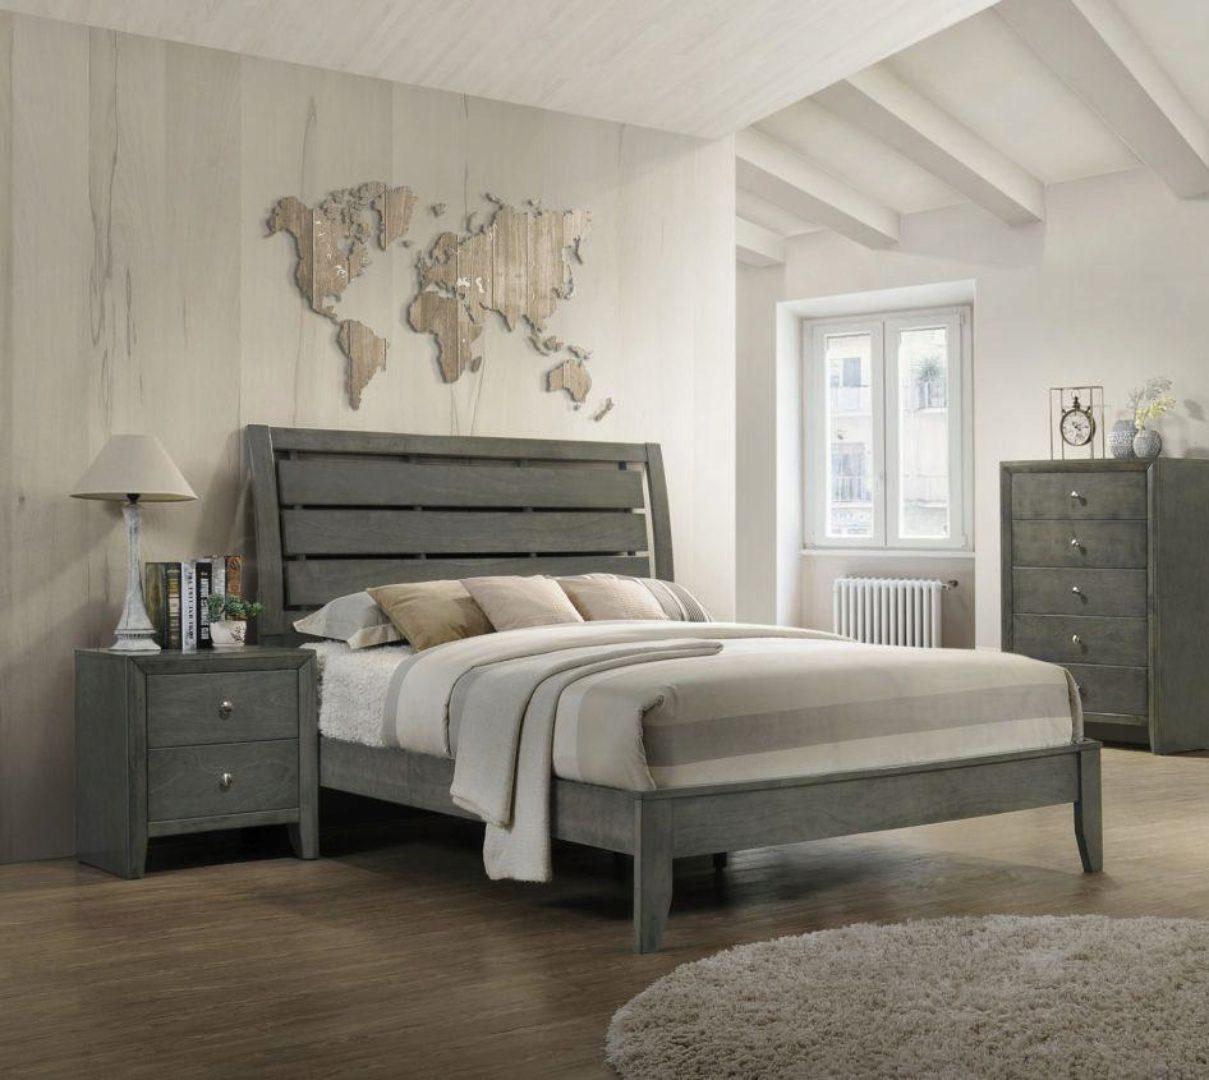 Crown Mark B4720 Evan Solid Wood Grey Finish King Size Bedroom Set 3pcs B4720 Ek Set 3